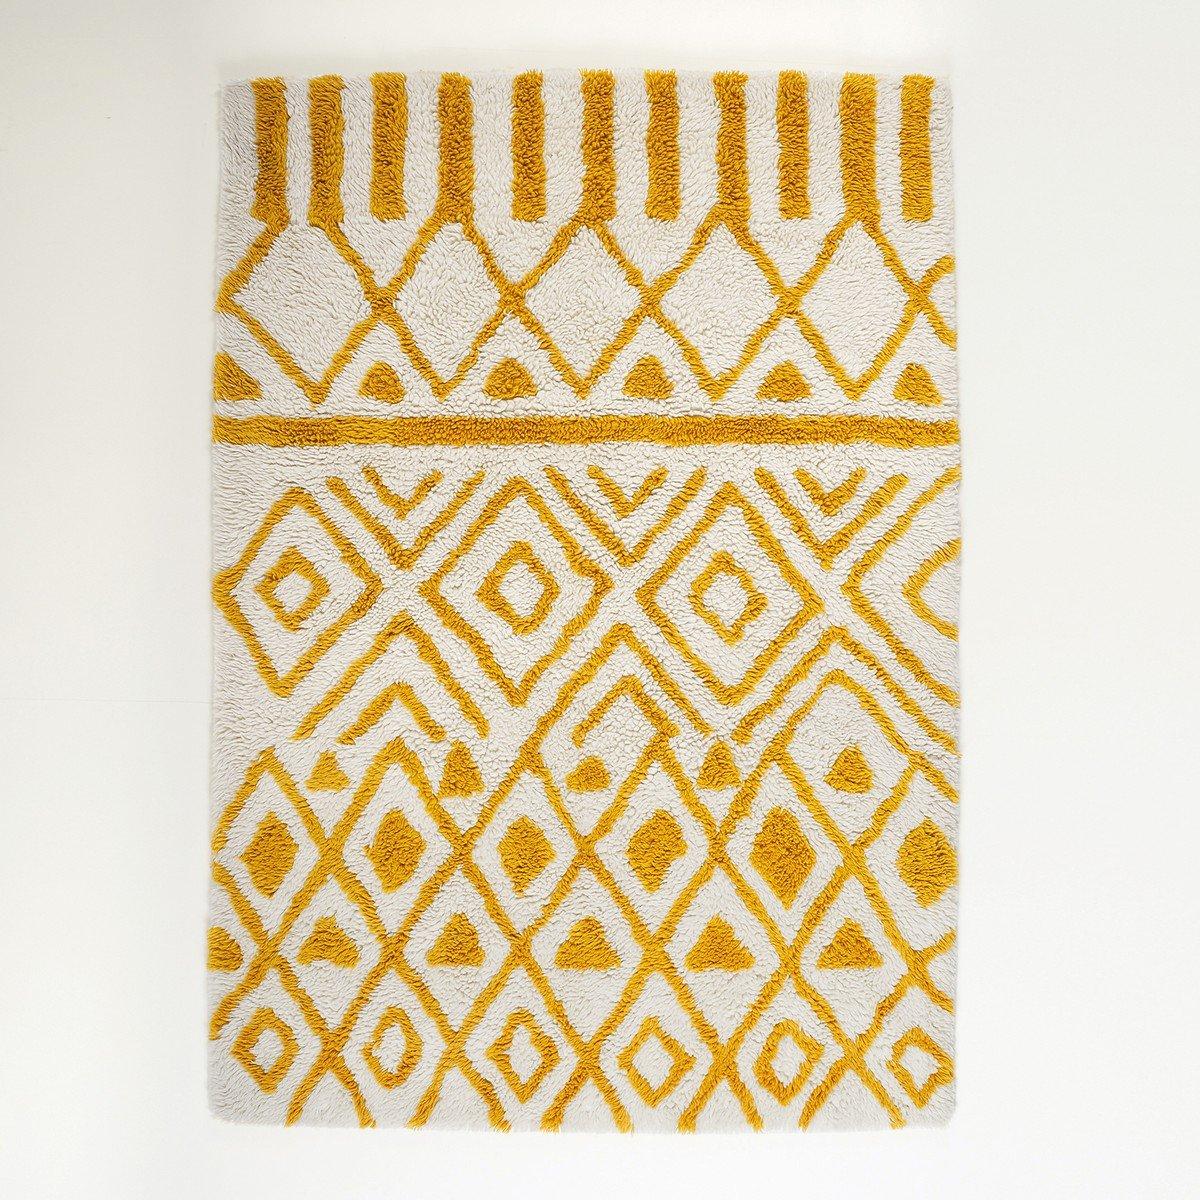 2ac0b63aa4 La Redoute Interieurs Ocrul Berber Style Wool Rug  Amazon.co.uk  Kitchen    Home